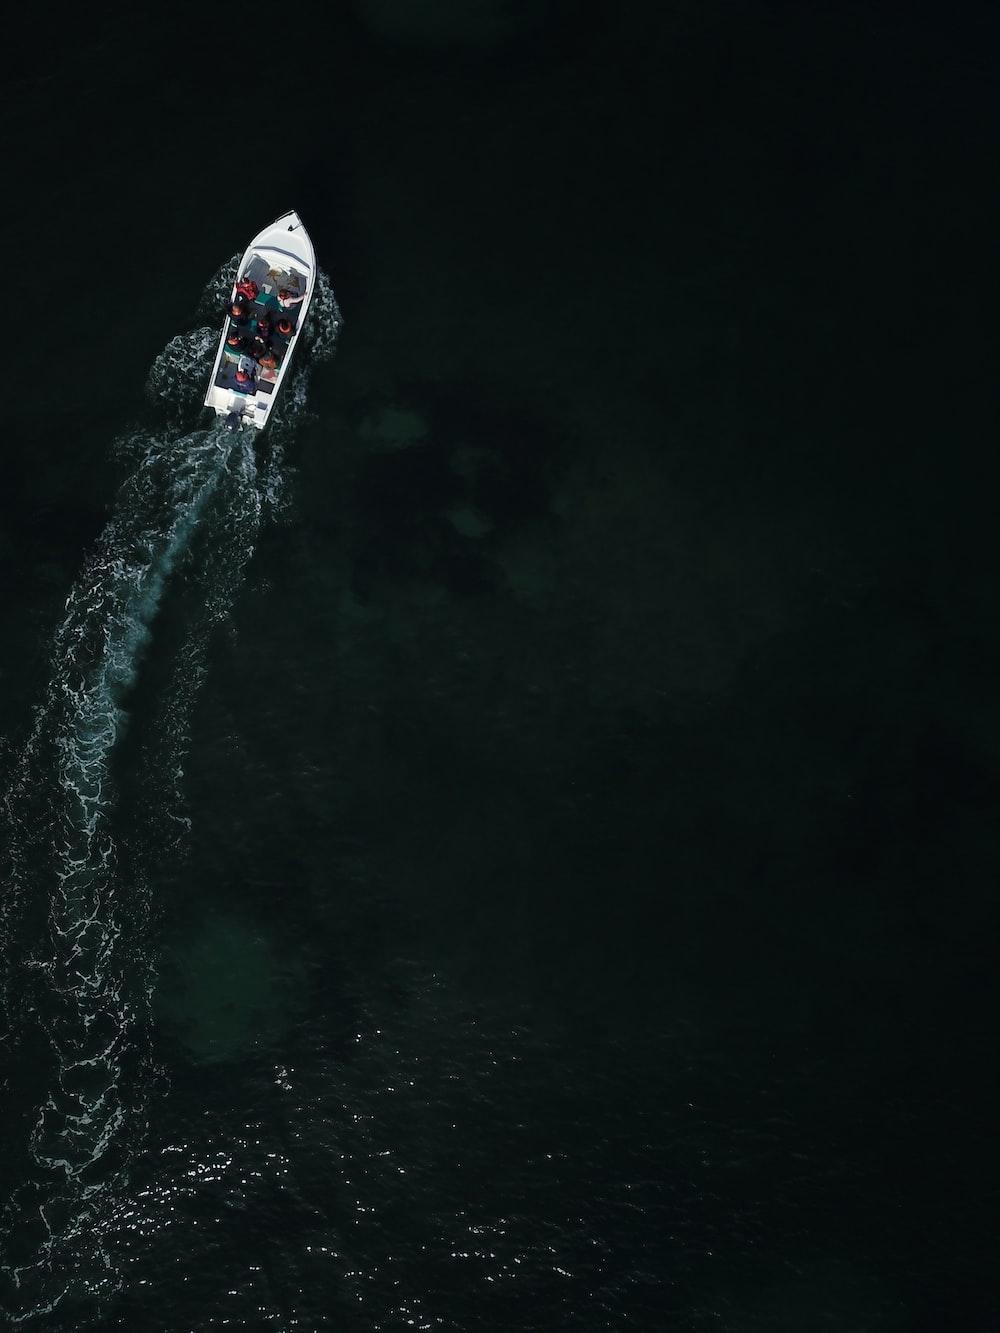 bird's-eye-view photo of white boat